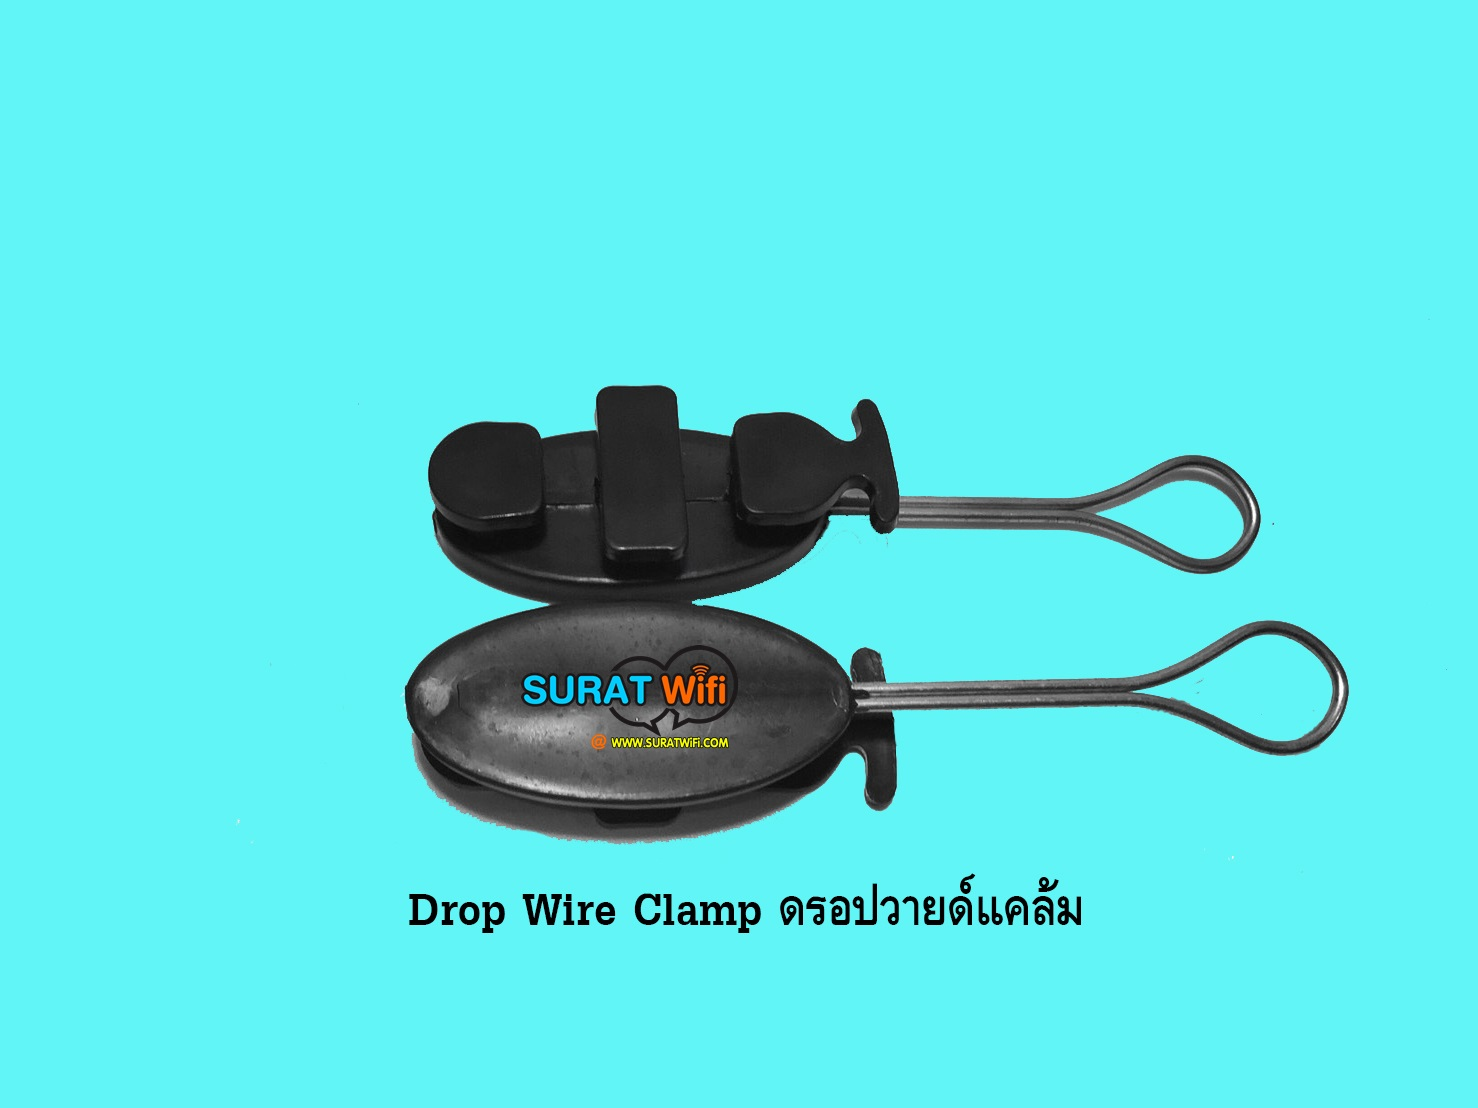 Drop Wire Clamp ดรอปวายด์แคล้มFTTx